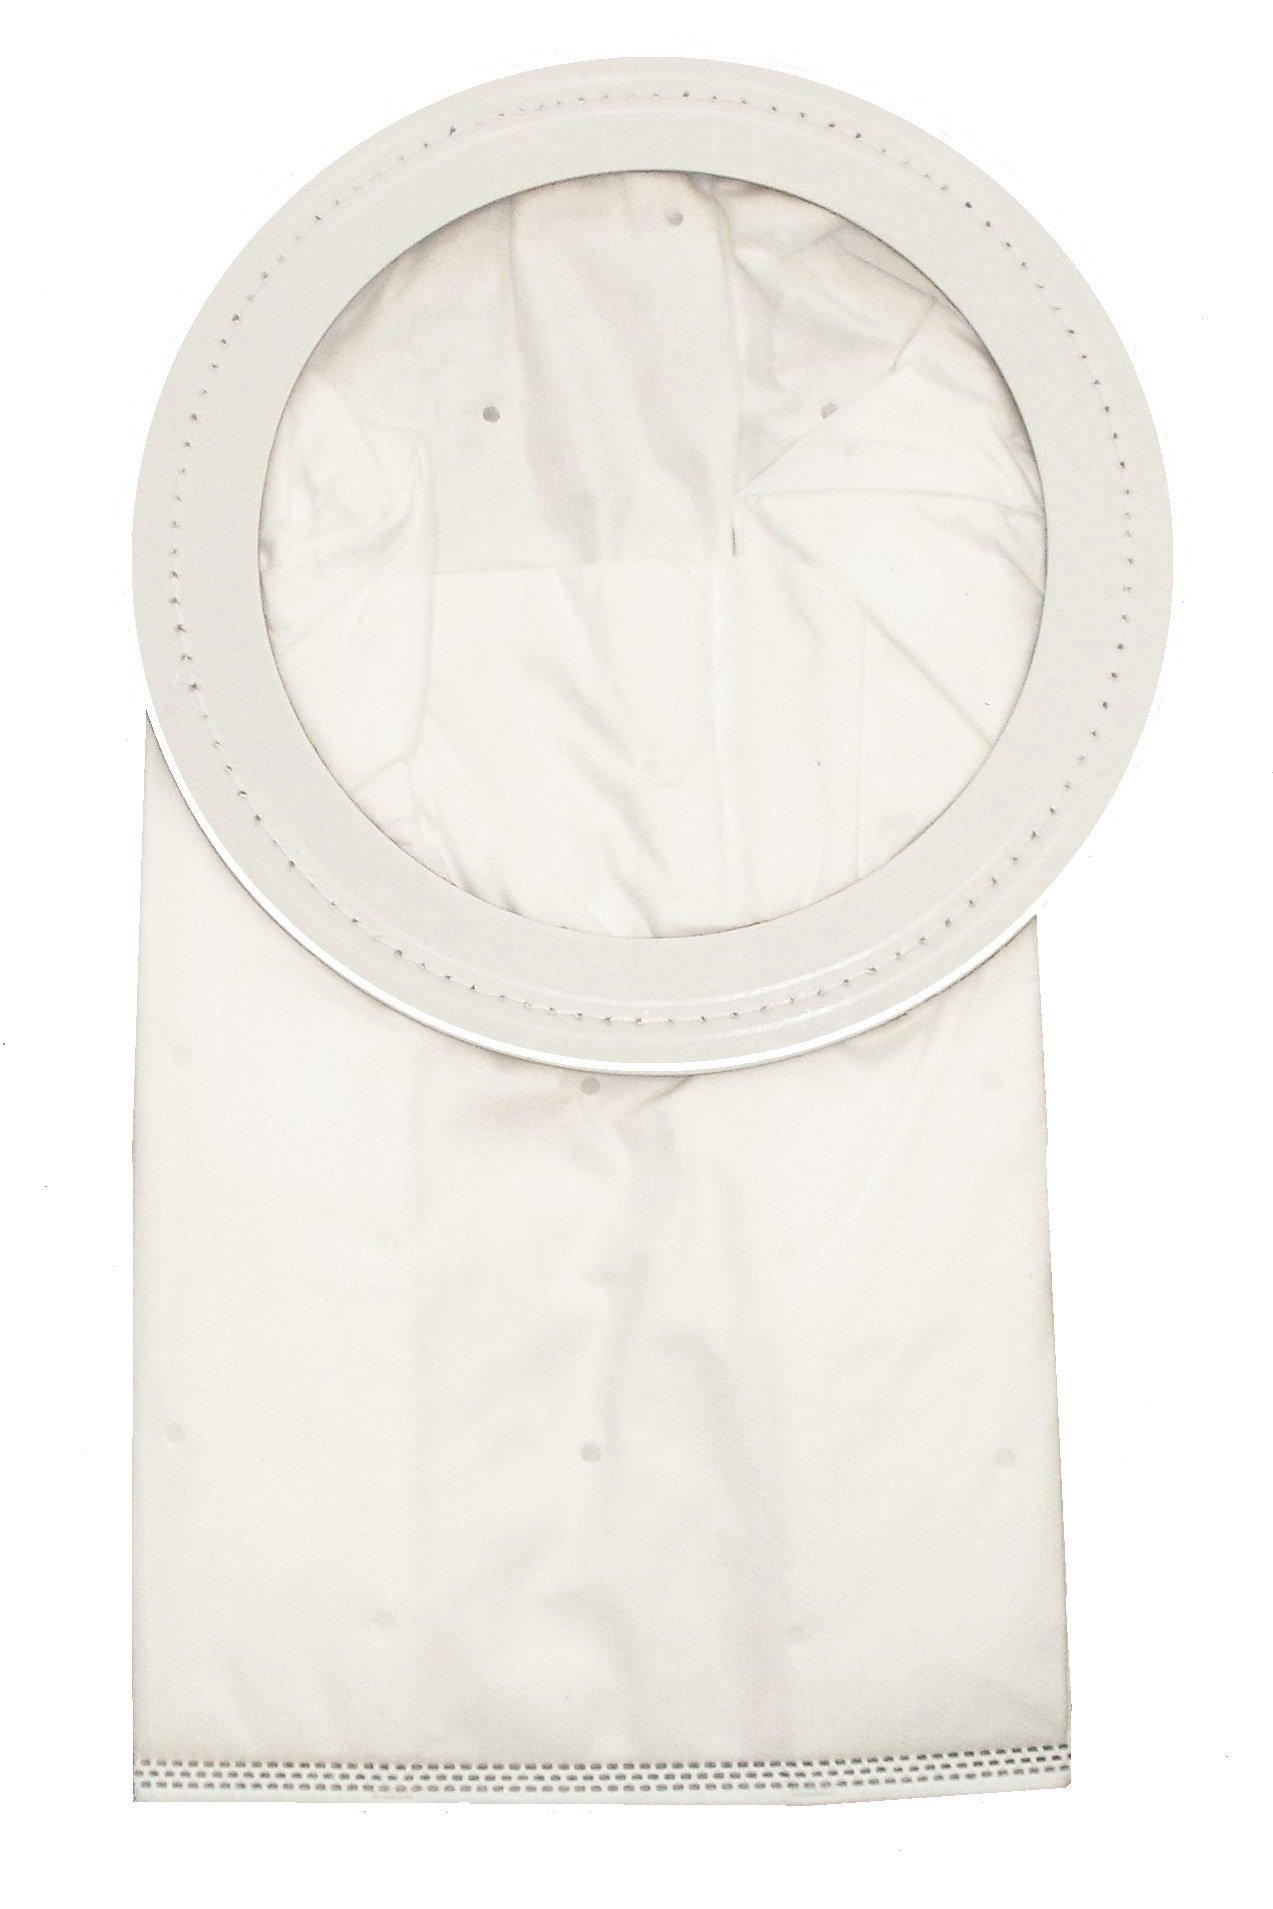 BISSELL BigGreen Commercial BG151802 Advance Filtration Disposable Bags for BG1006 Series 6 quart Backpack